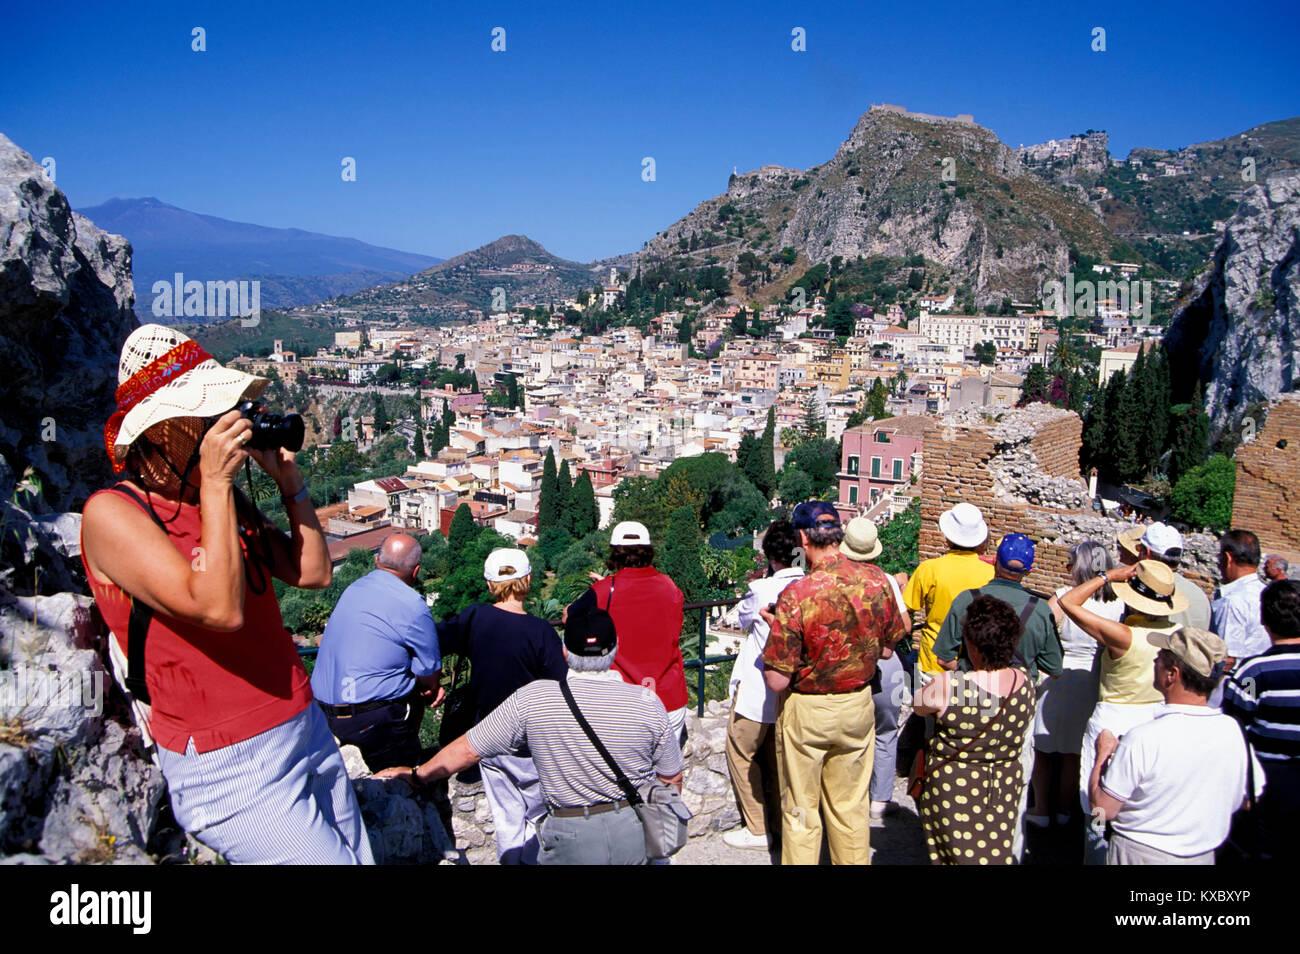 Taormina, view from Teatro Greco to Aetna, Sicily, ITALY, Europe - Stock Image